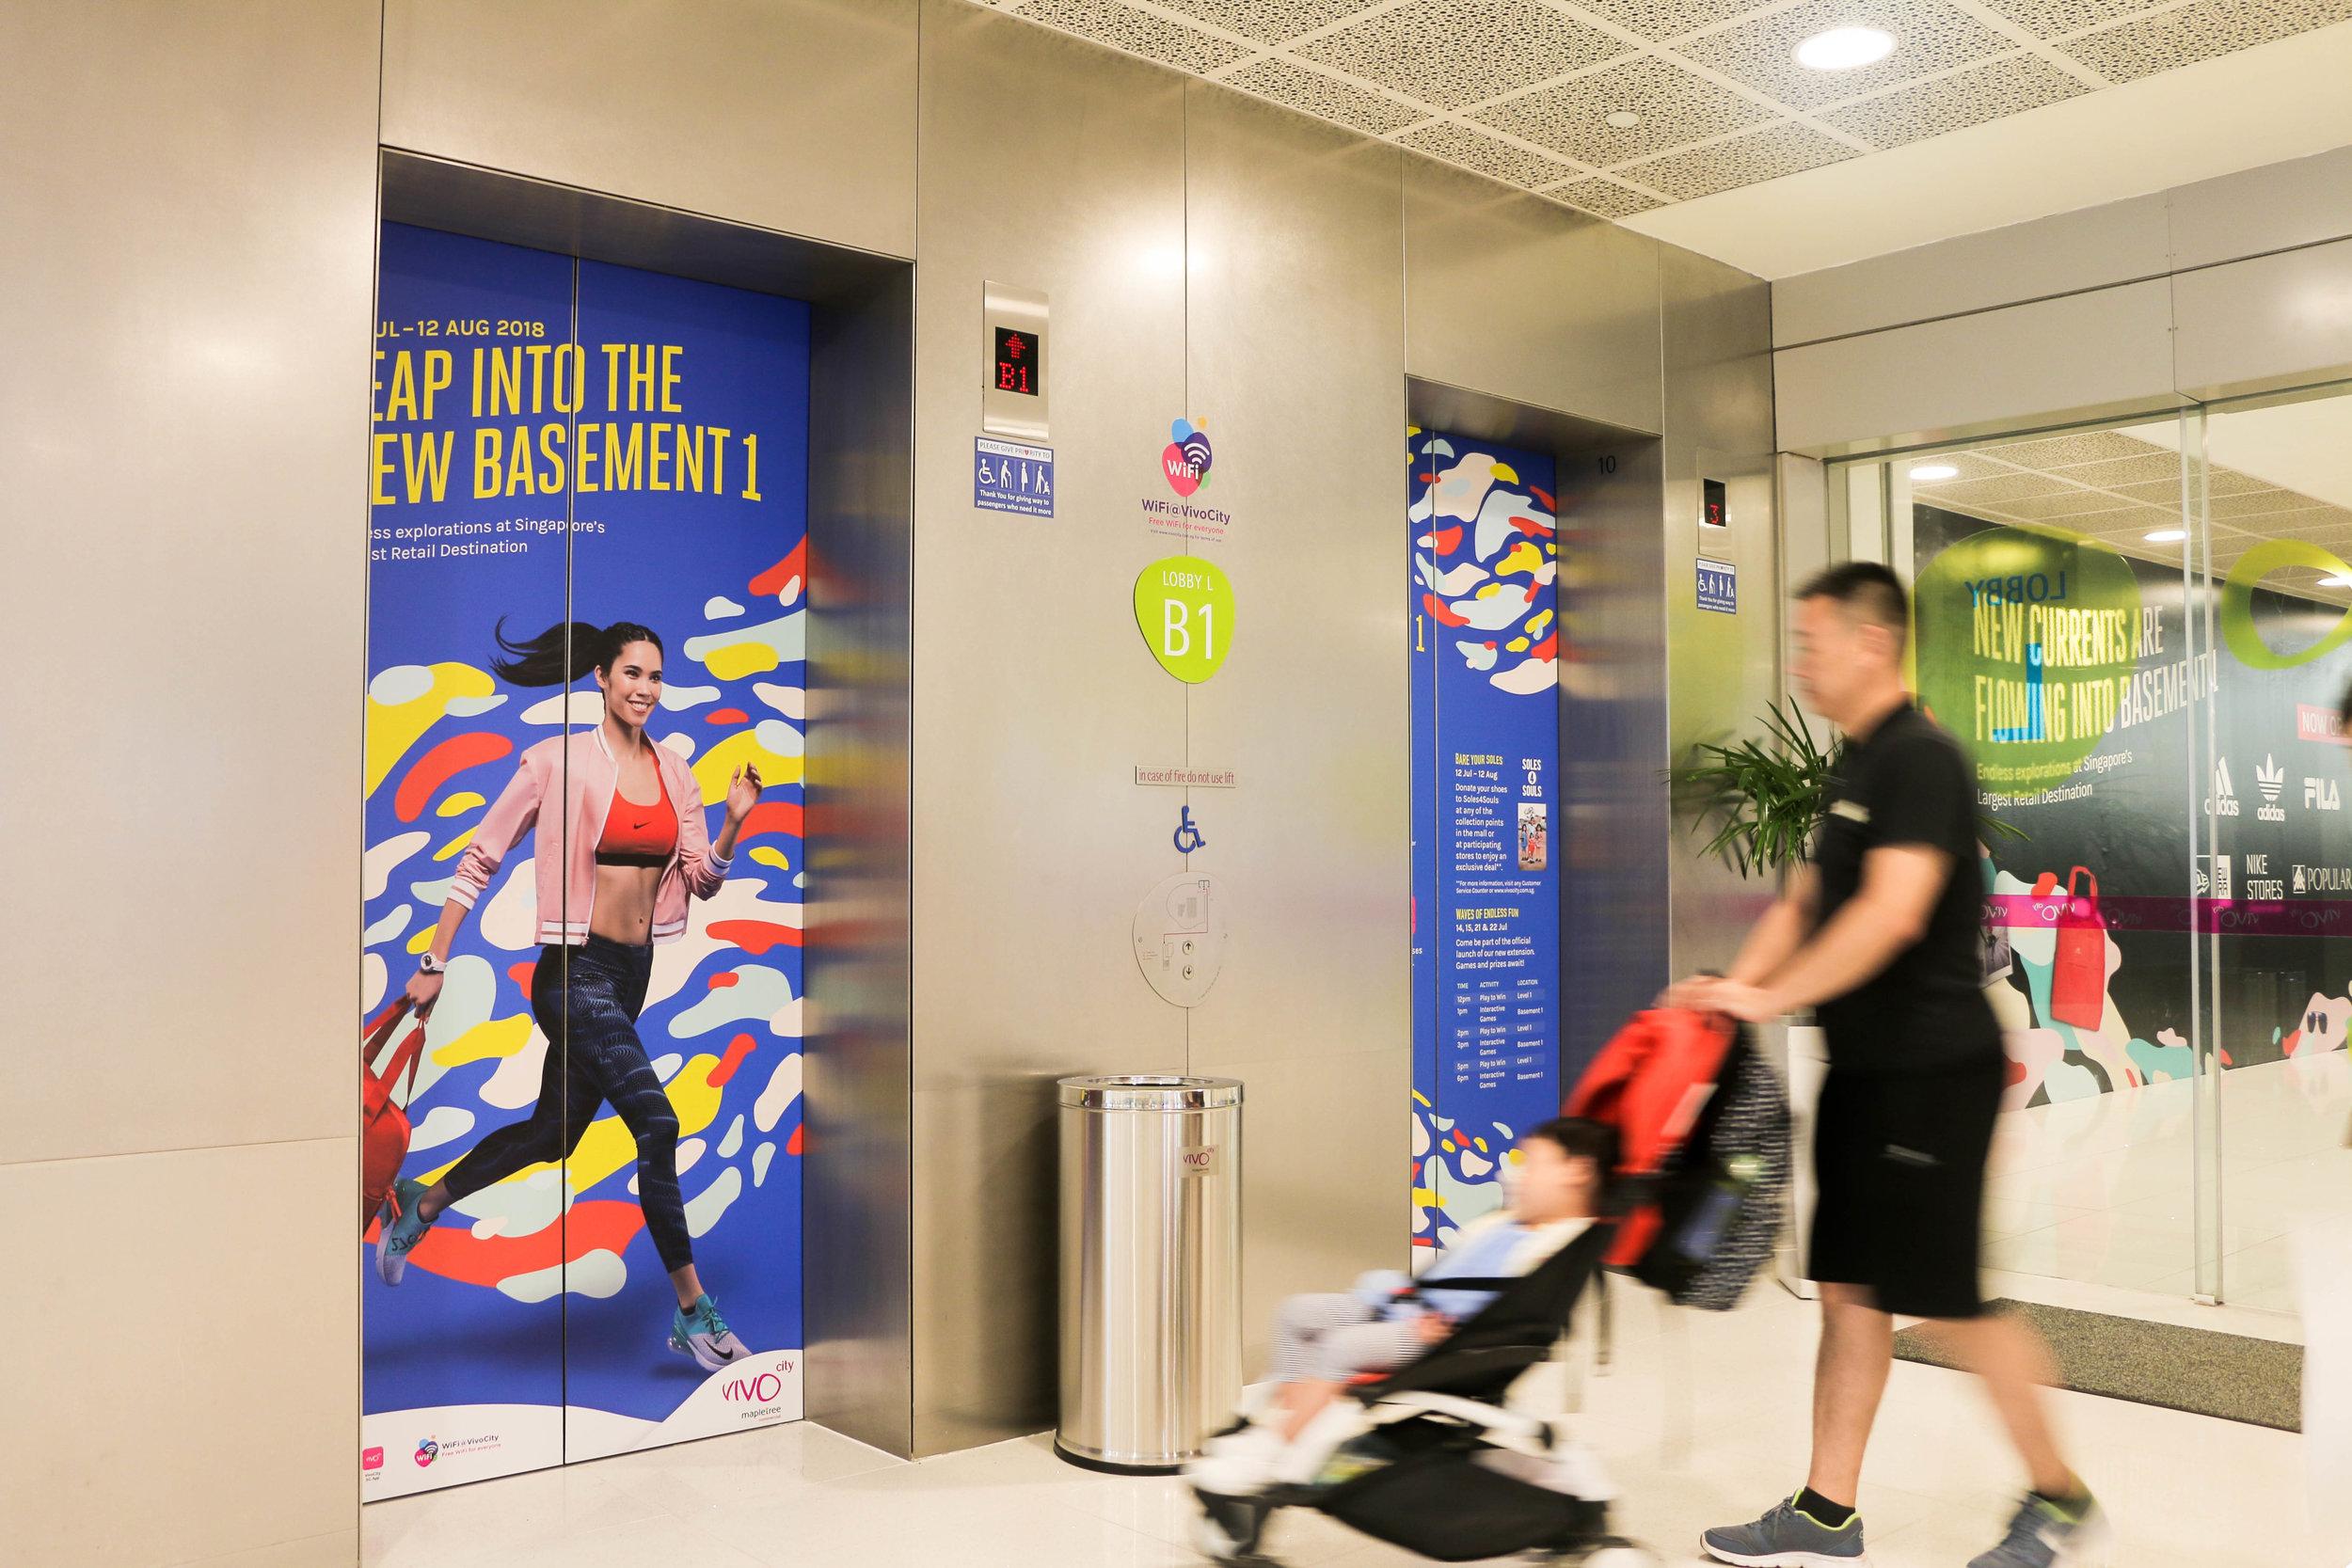 outeredit vivocity basement 1 lift doors